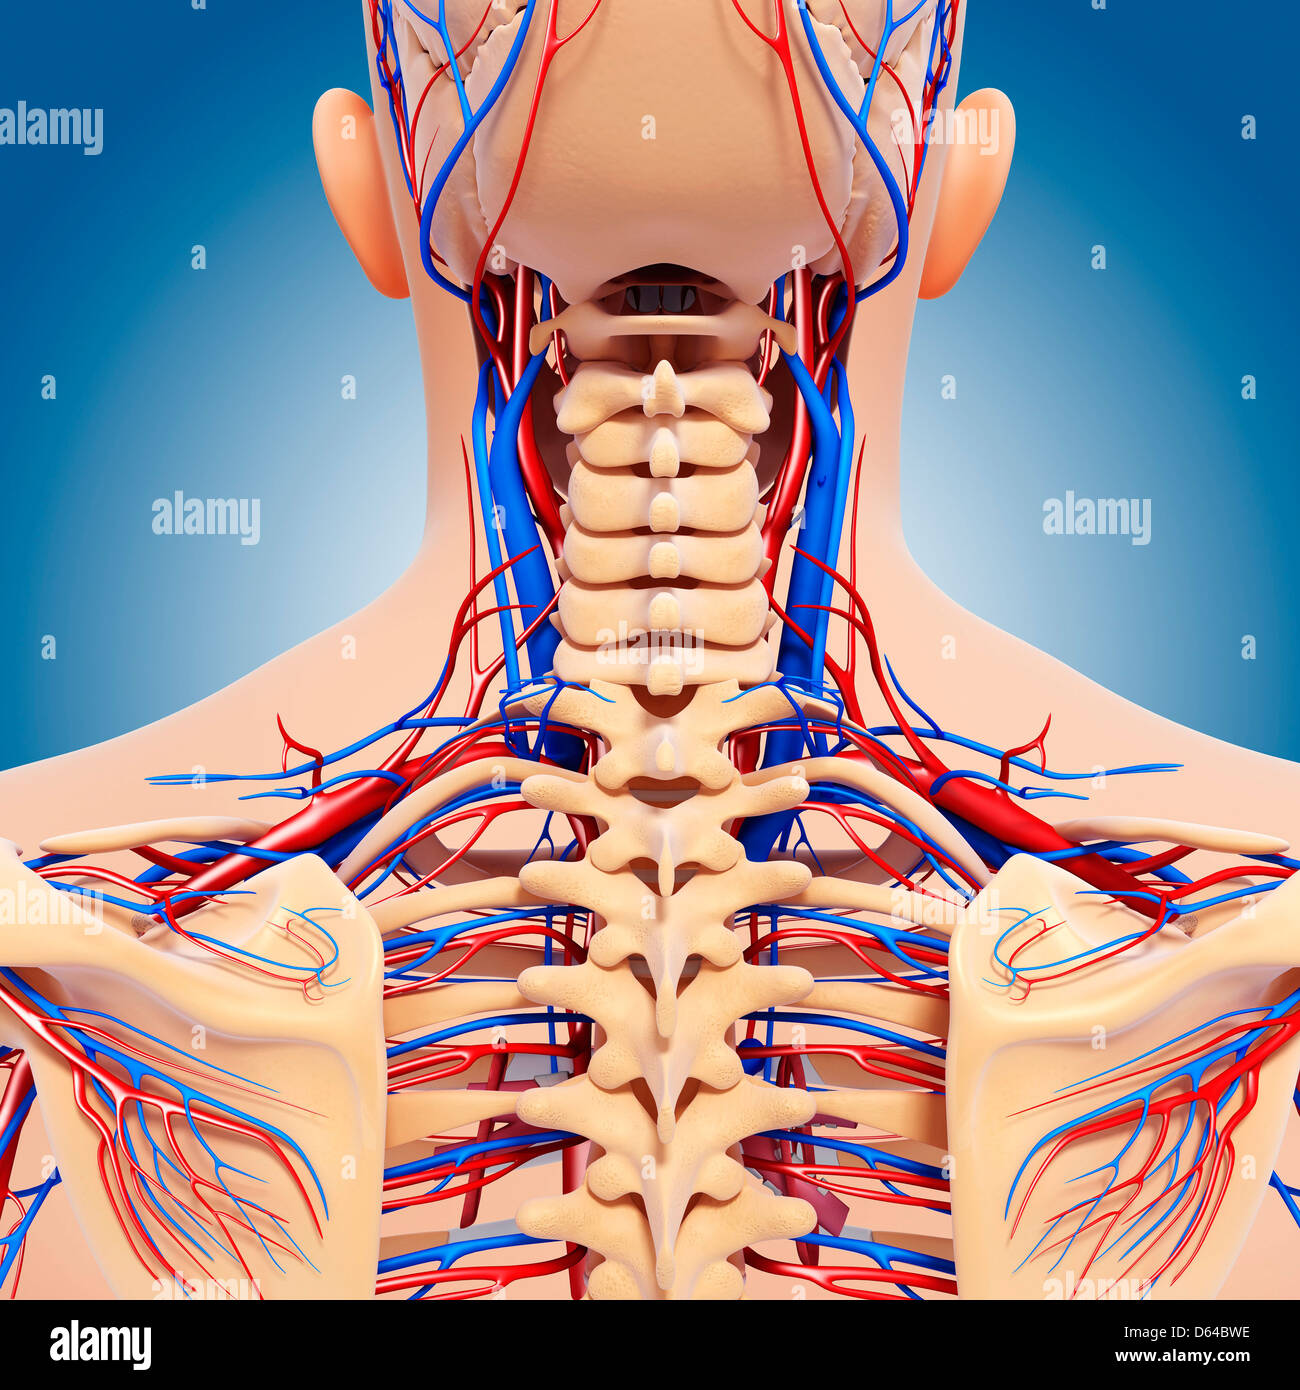 Oberkörper-Anatomie, artwork Stockfoto, Bild: 55416186 - Alamy